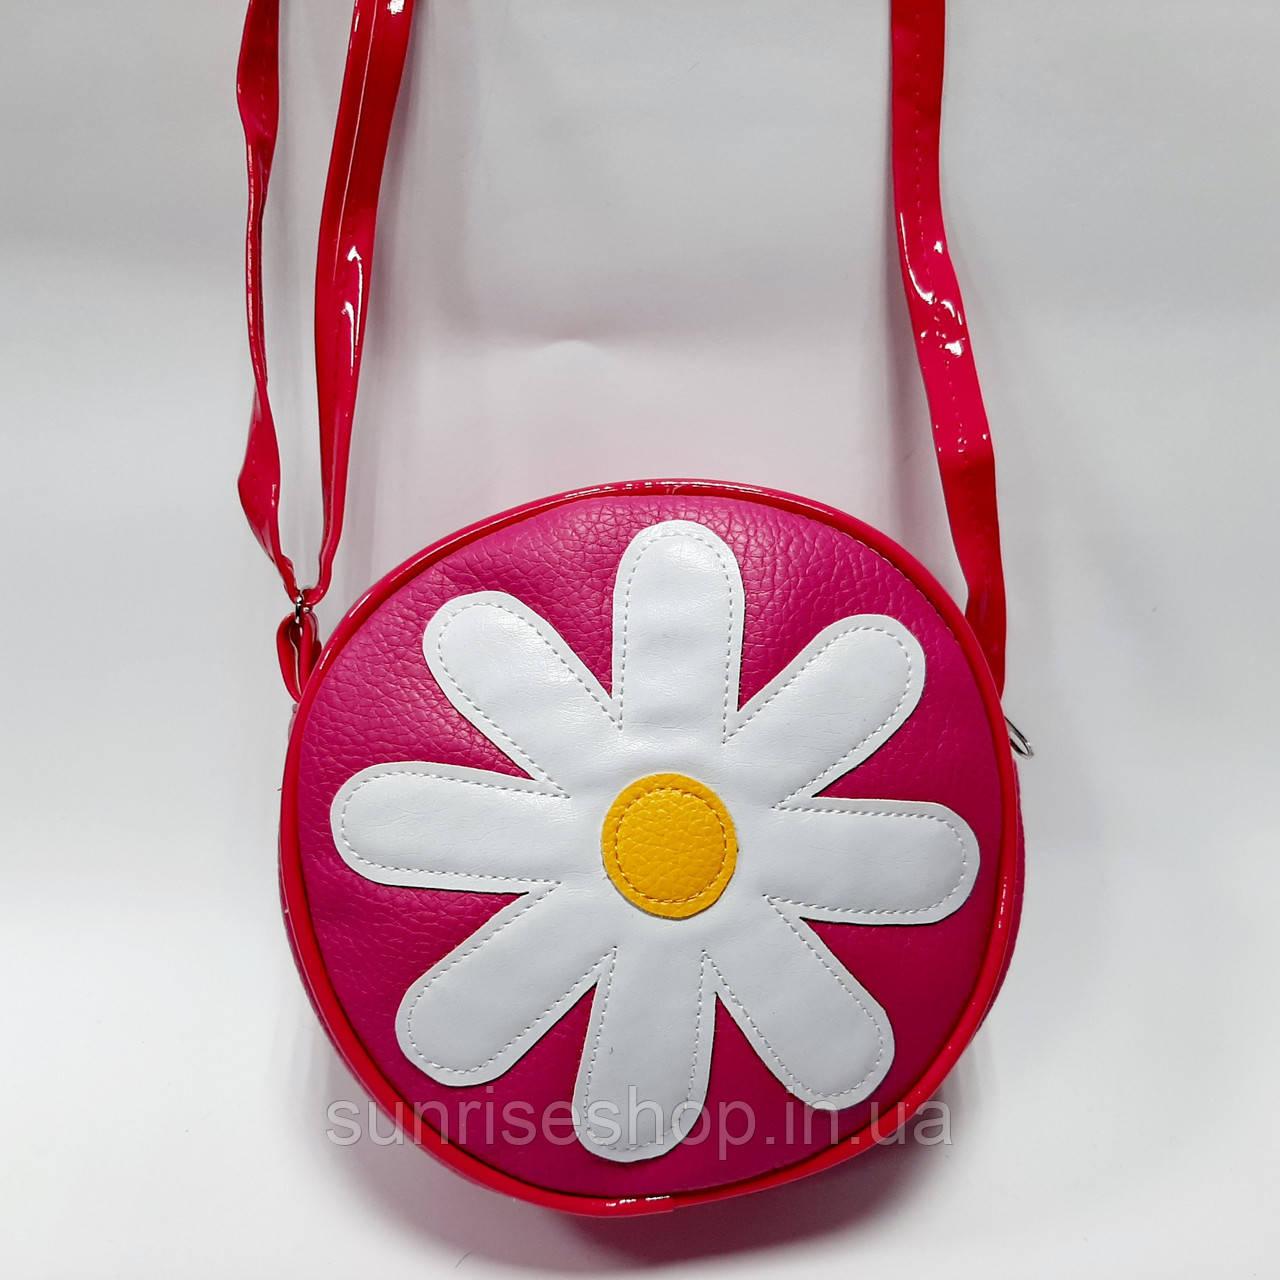 Детская сумочка круглая